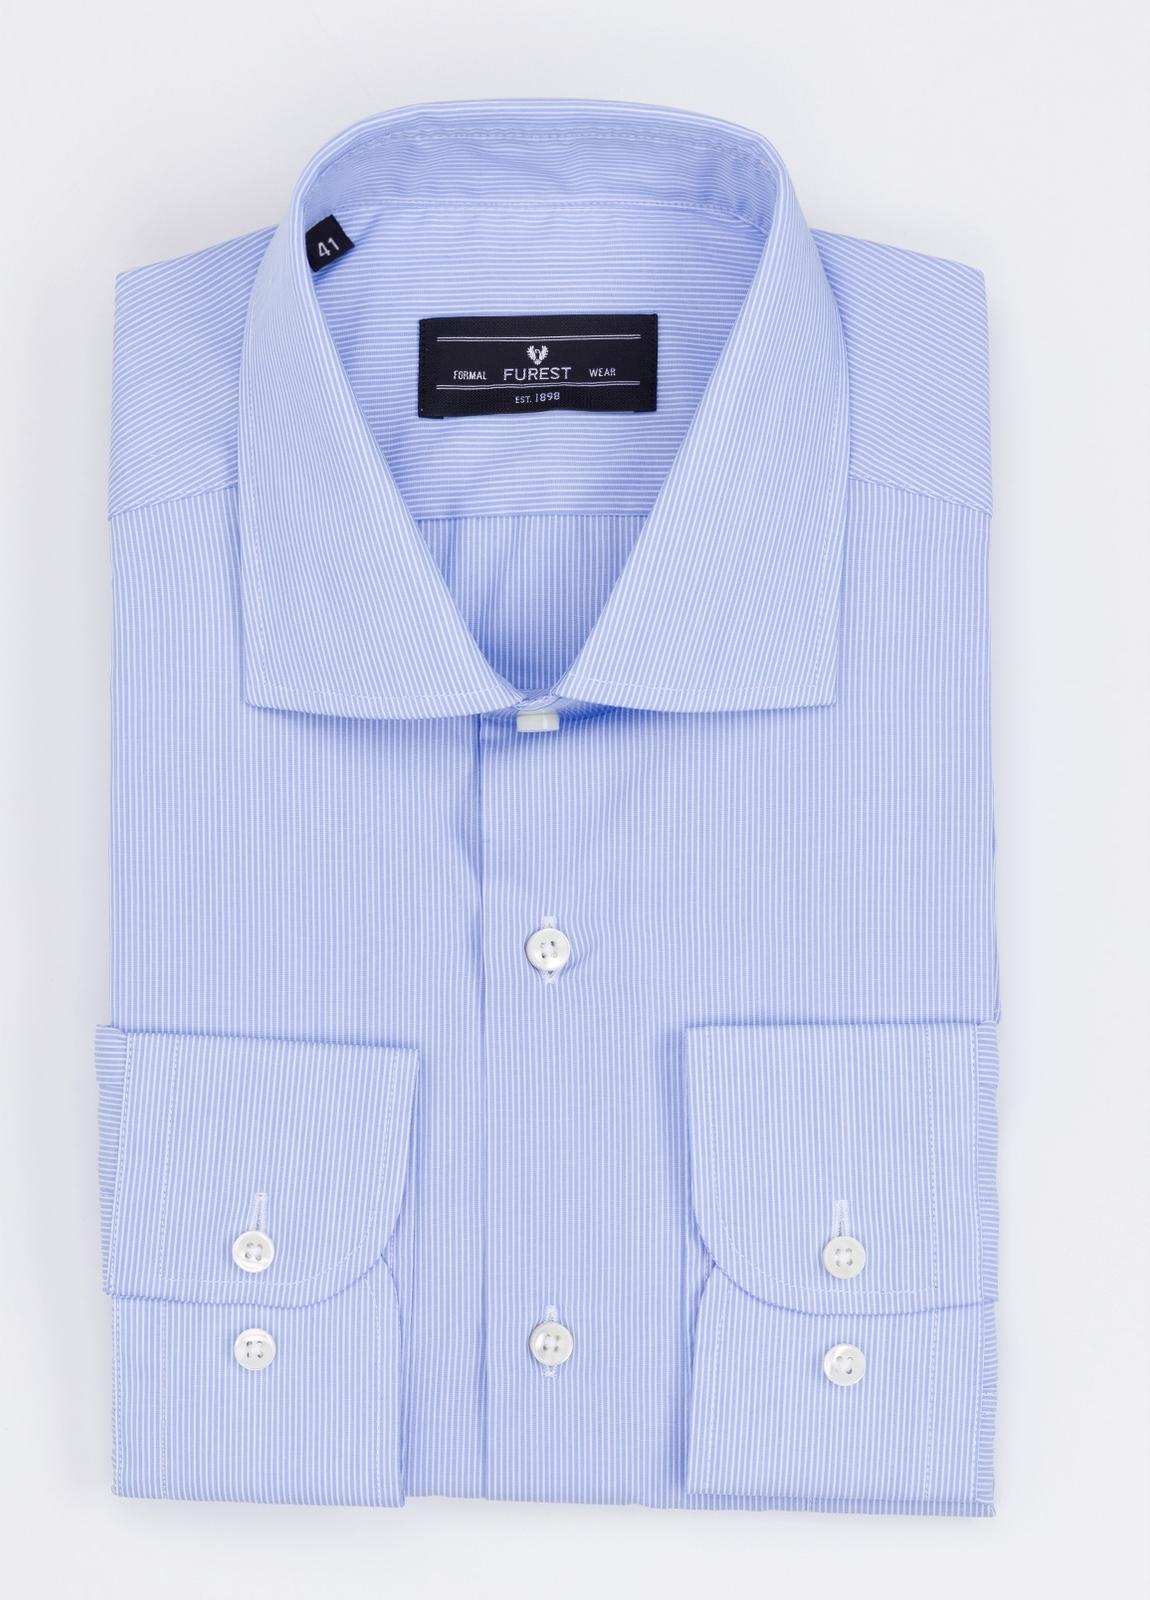 Camisa Formal Wear REGULAR FIT cuello italiano modelo TAILORED NAPOLI diseño microraya color azul. 100% Algodón.